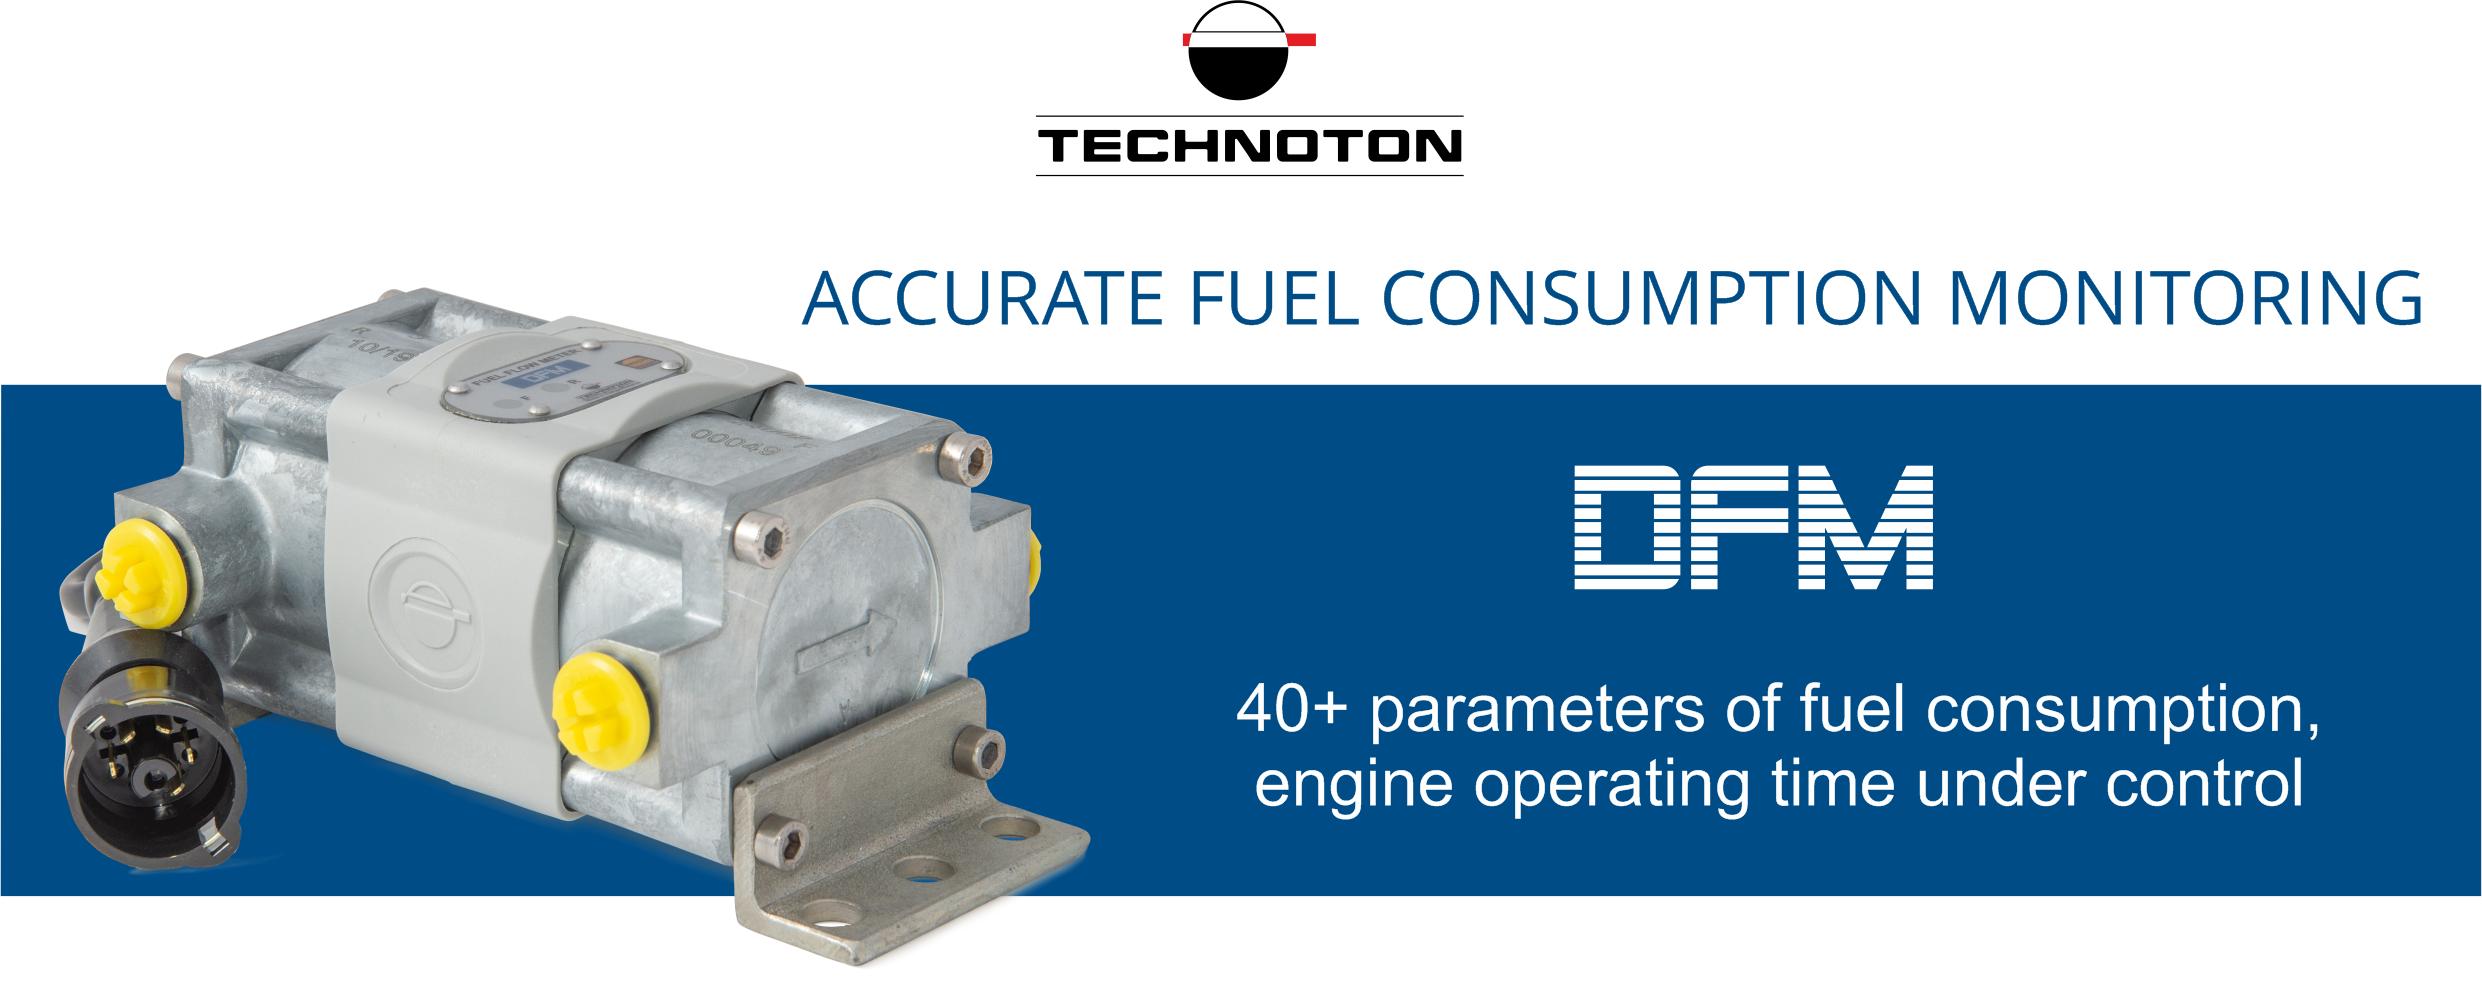 DFM flow meter - accurate fuel rate monitoring